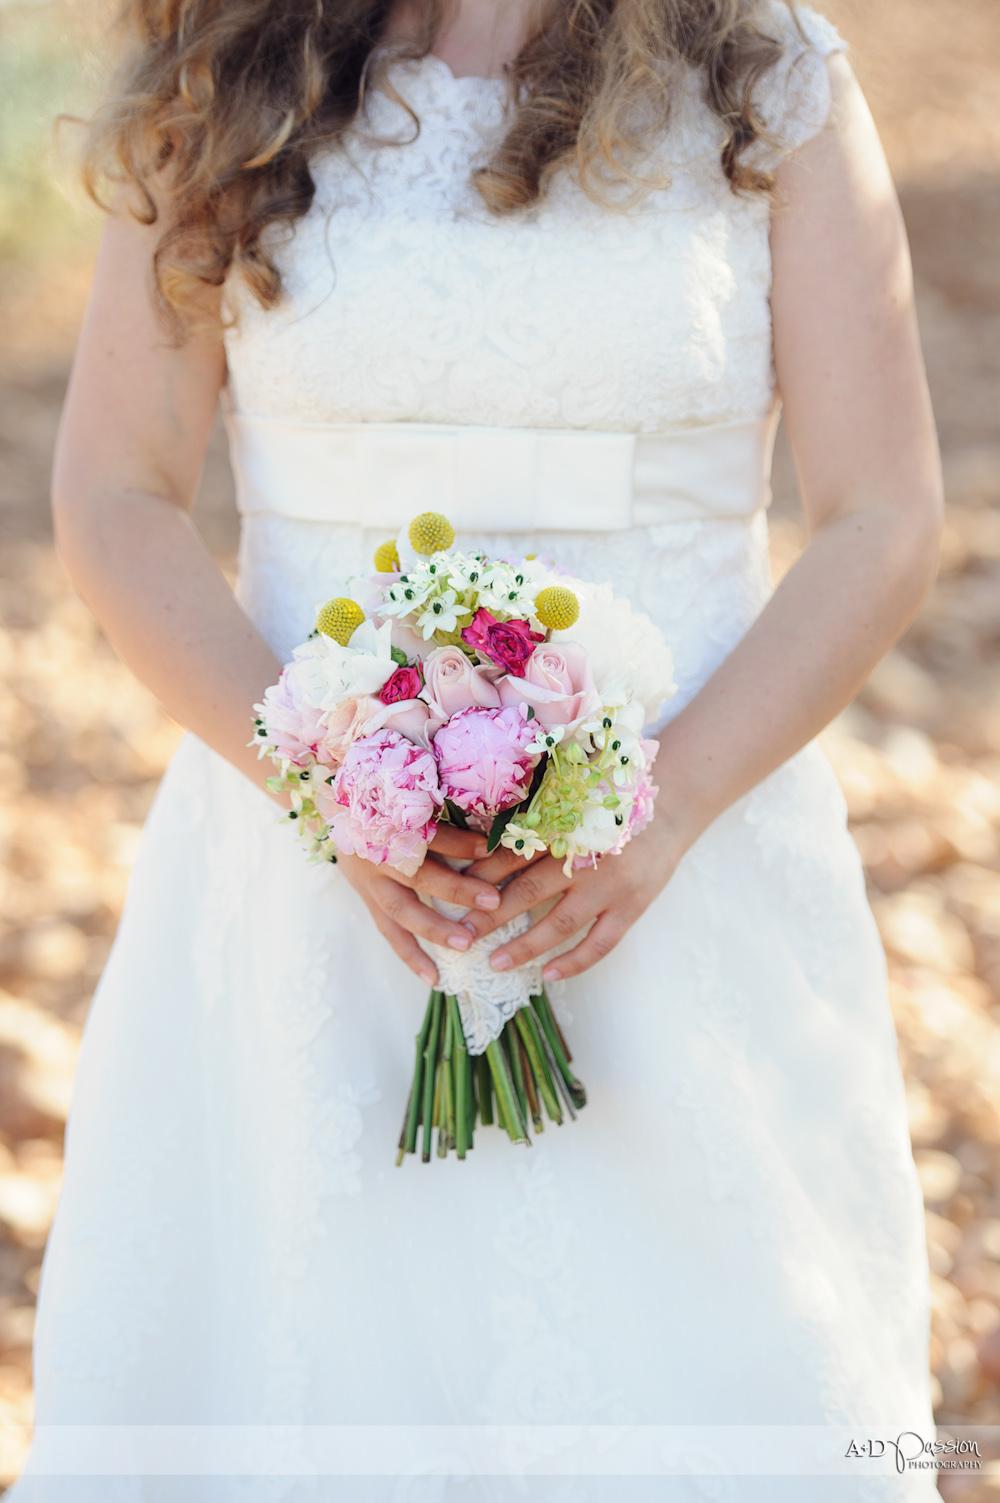 AD Passion Photography | ad-passion.com_fotograf-profesionist-nunta-spania_alice-si-eugen_0063 | Adelin, Dida, fotograf profesionist, fotograf de nunta, fotografie de nunta, fotograf Timisoara, fotograf Craiova, fotograf Bucuresti, fotograf Arad, nunta Timisoara, nunta Arad, nunta Bucuresti, nunta Craiova